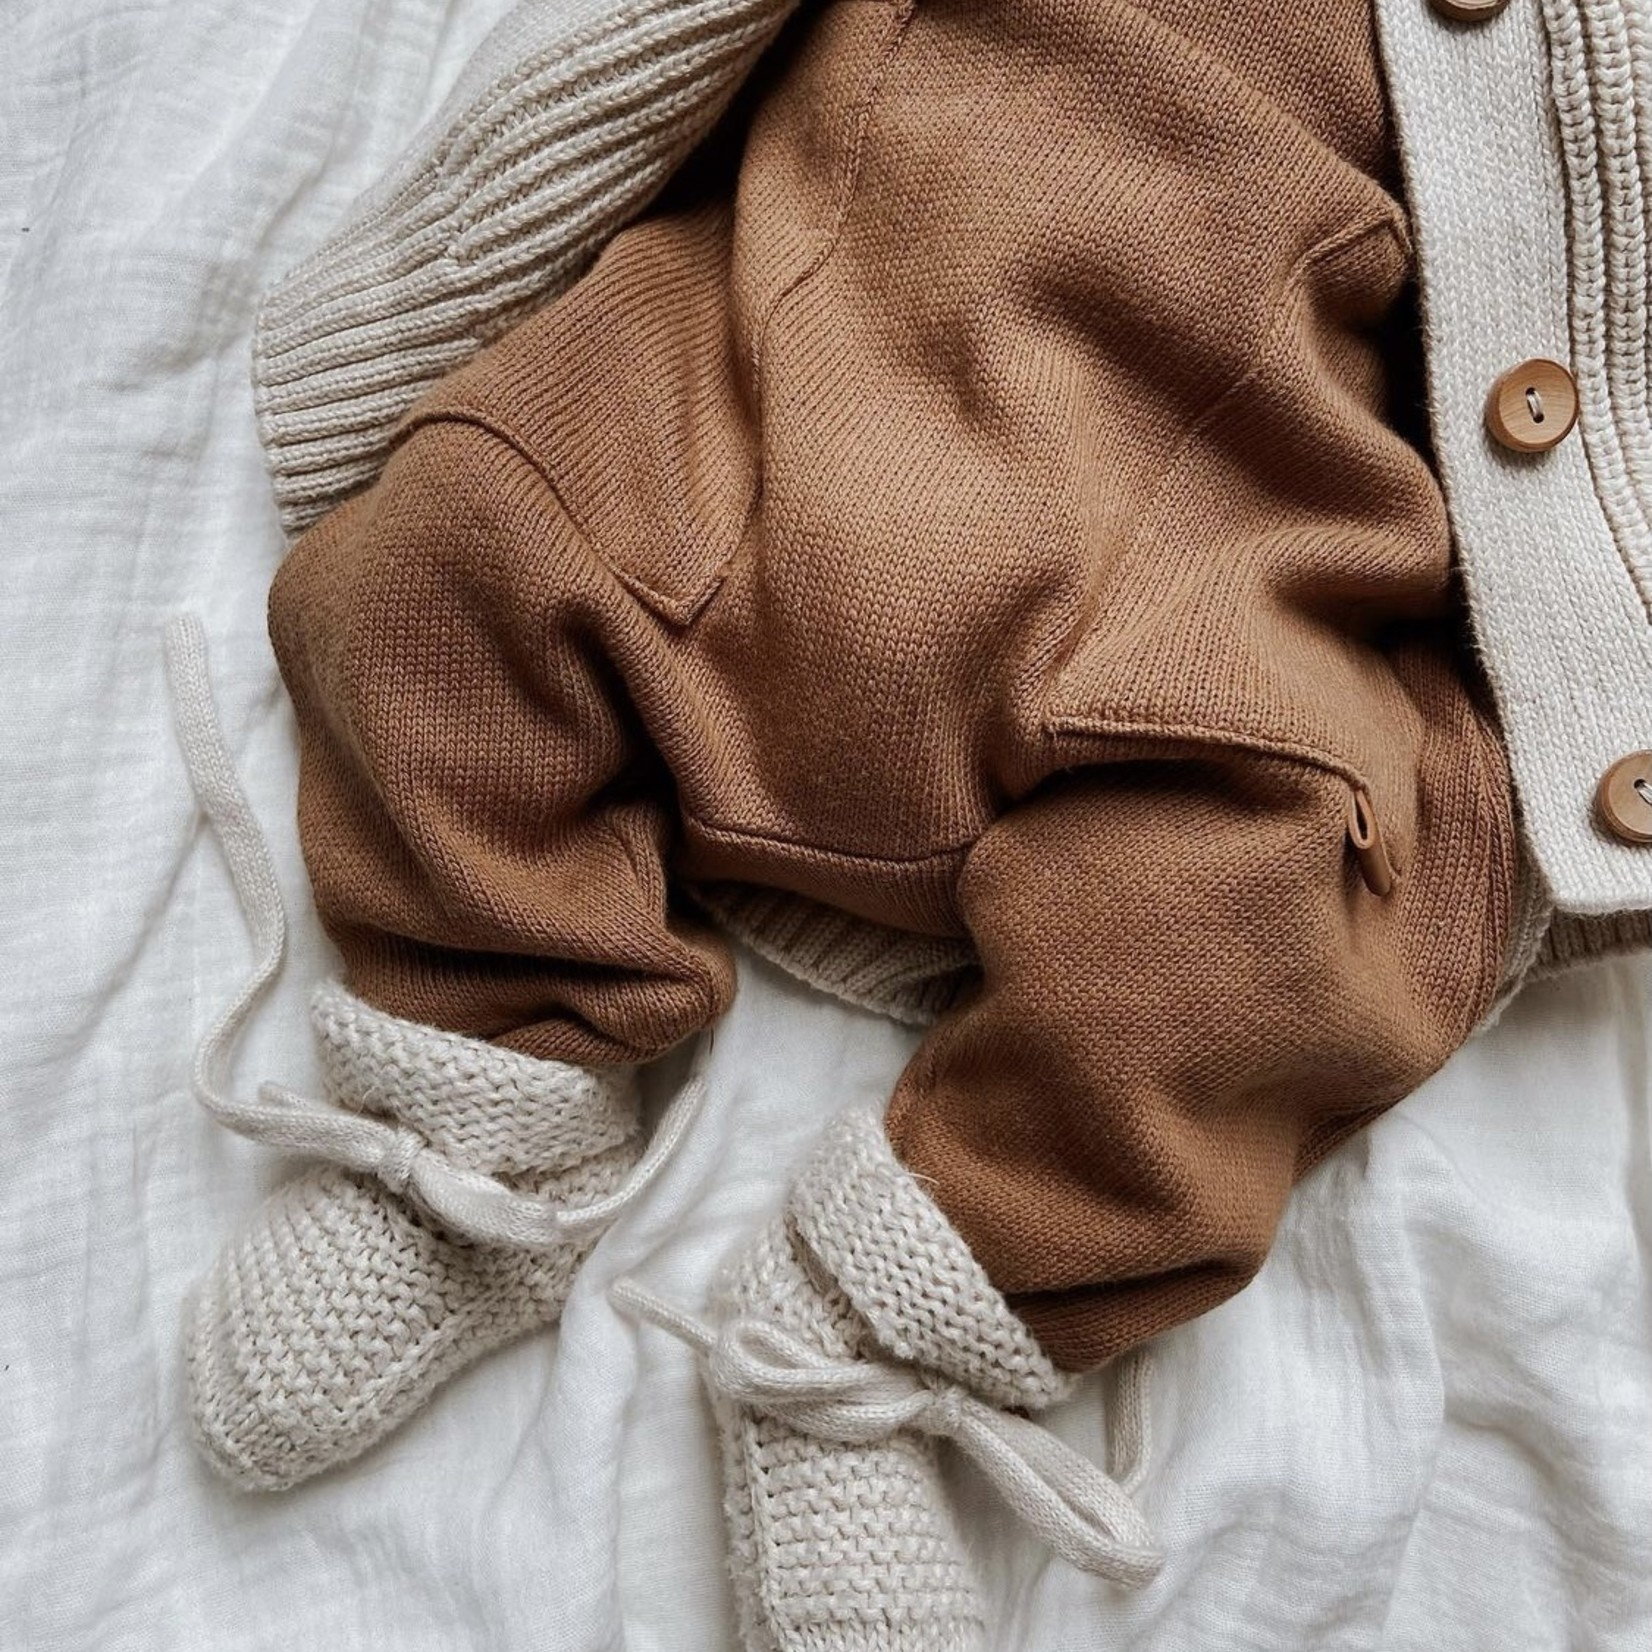 GUAPOO GUAPOO |Soft Knit Booties - Oat 0-3 maanden